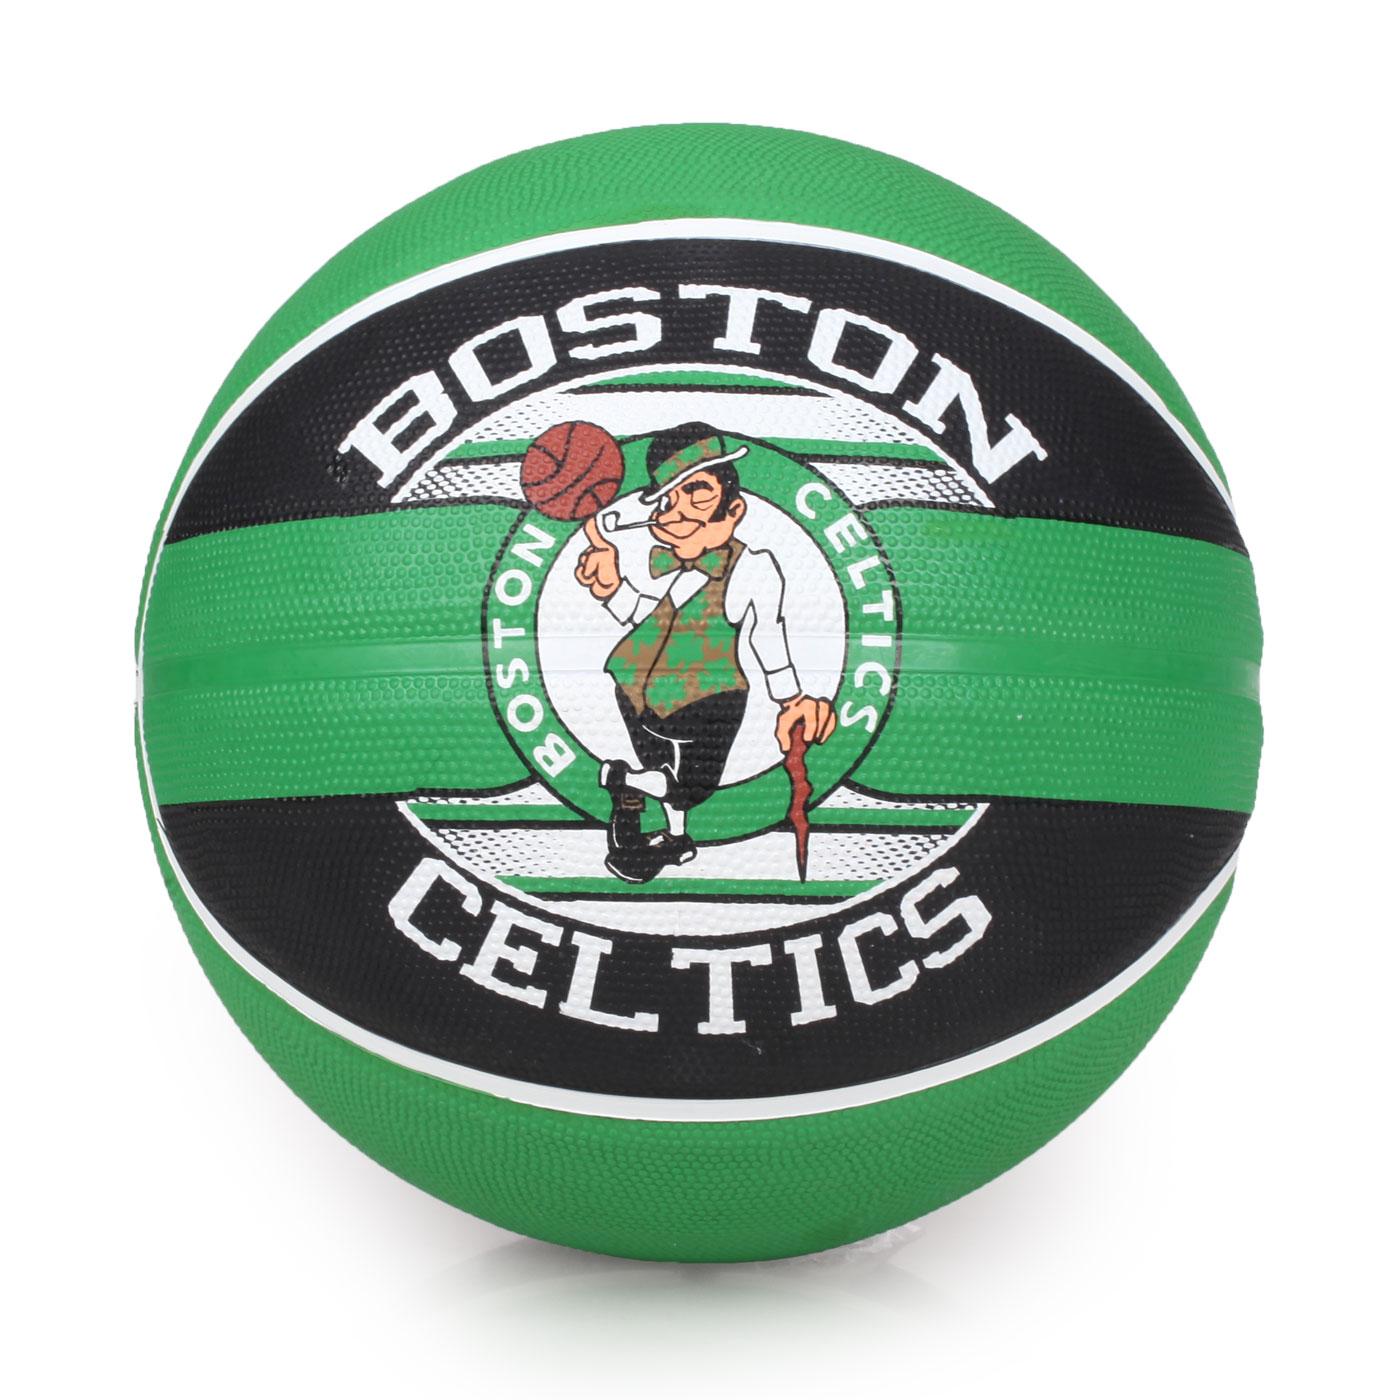 SPALDING 賽爾提克 Celtics 籃球 SPA83505 - 綠黑白